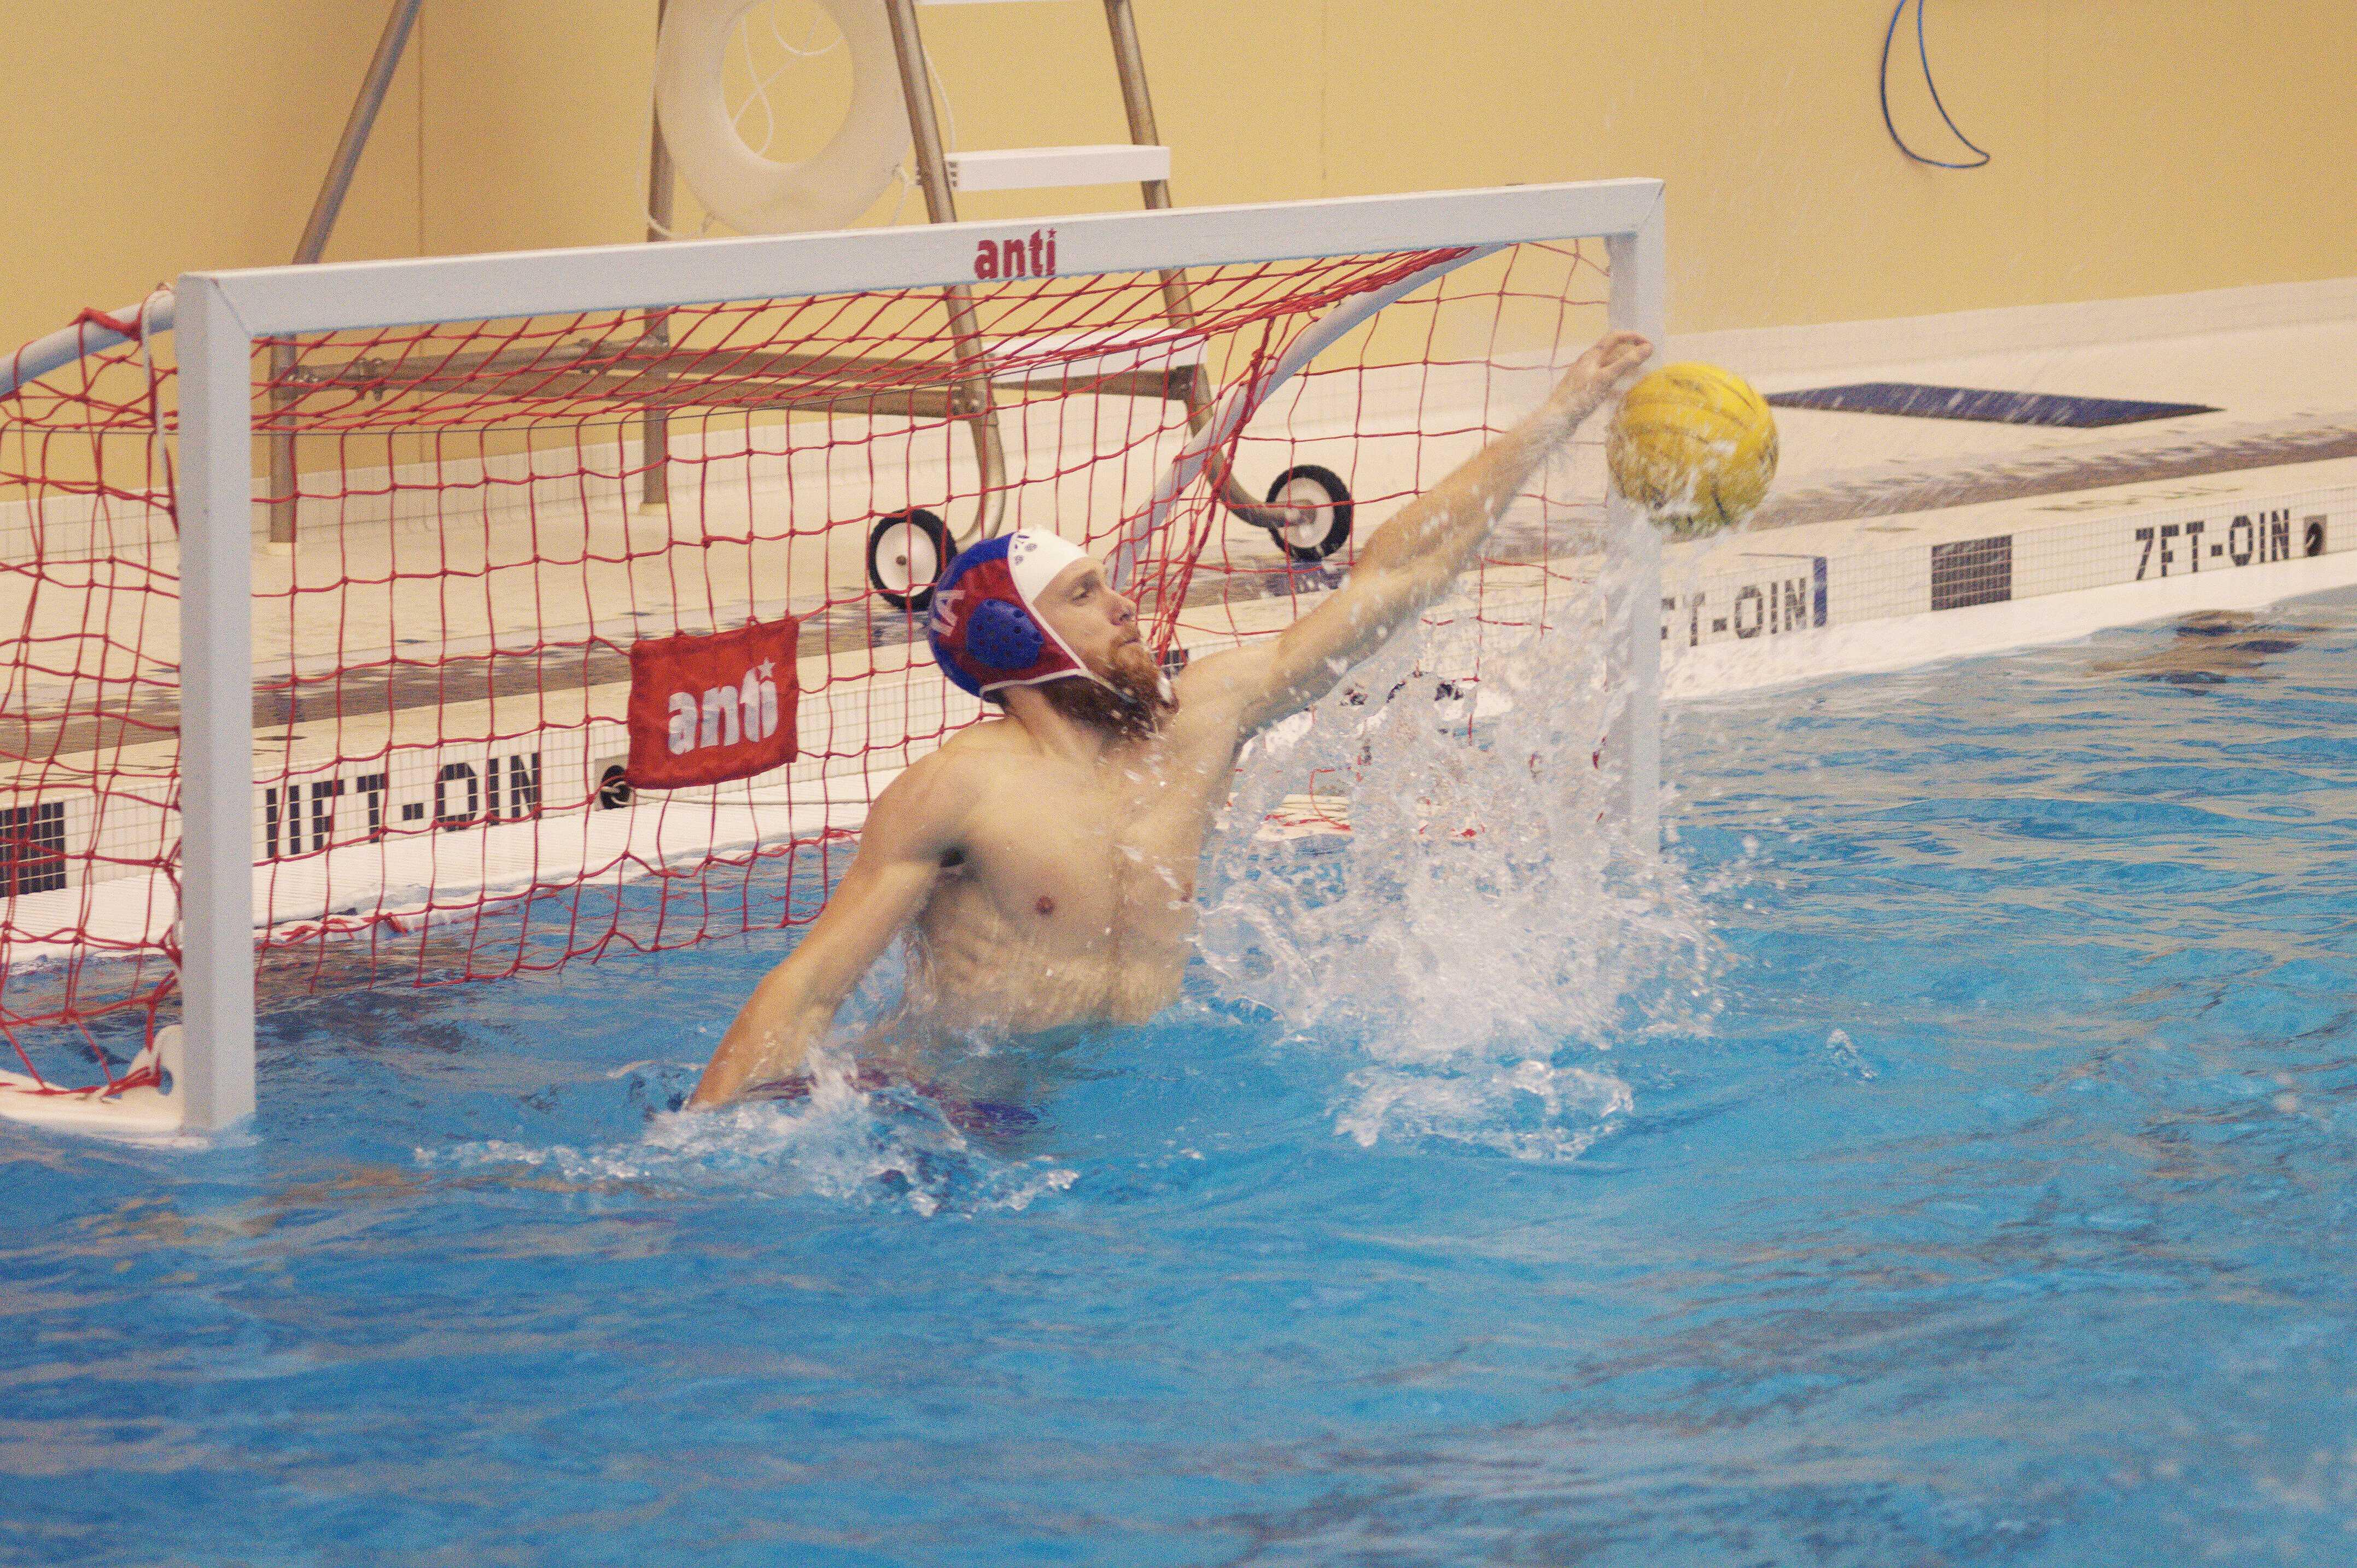 Co-captain Simon Sanggaard'15 defends the goal. Photo courtesy of Jenny Charlesworth.